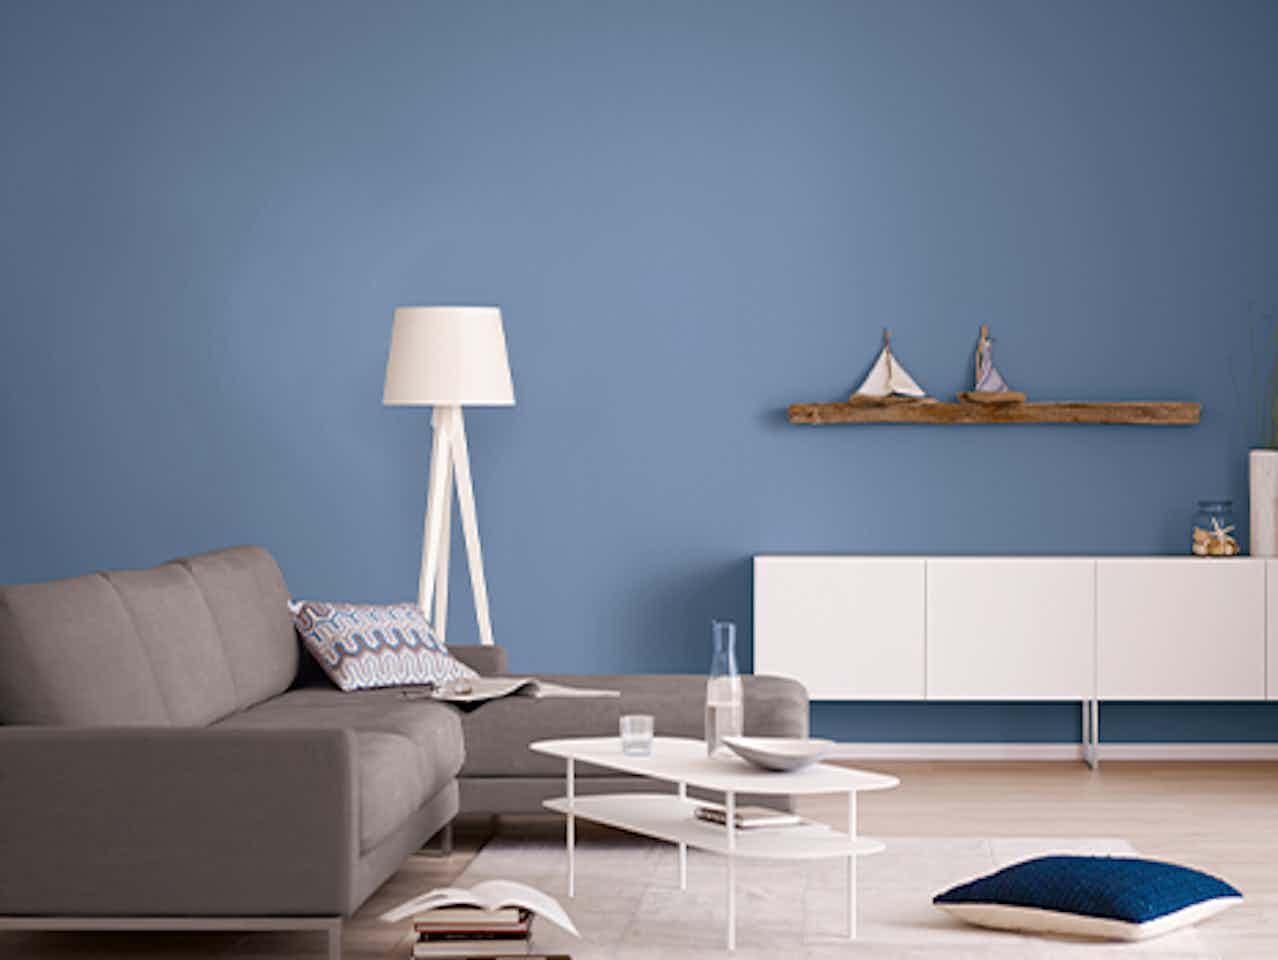 Alpina Farbrezepte, blaue Wandfarbe für innen